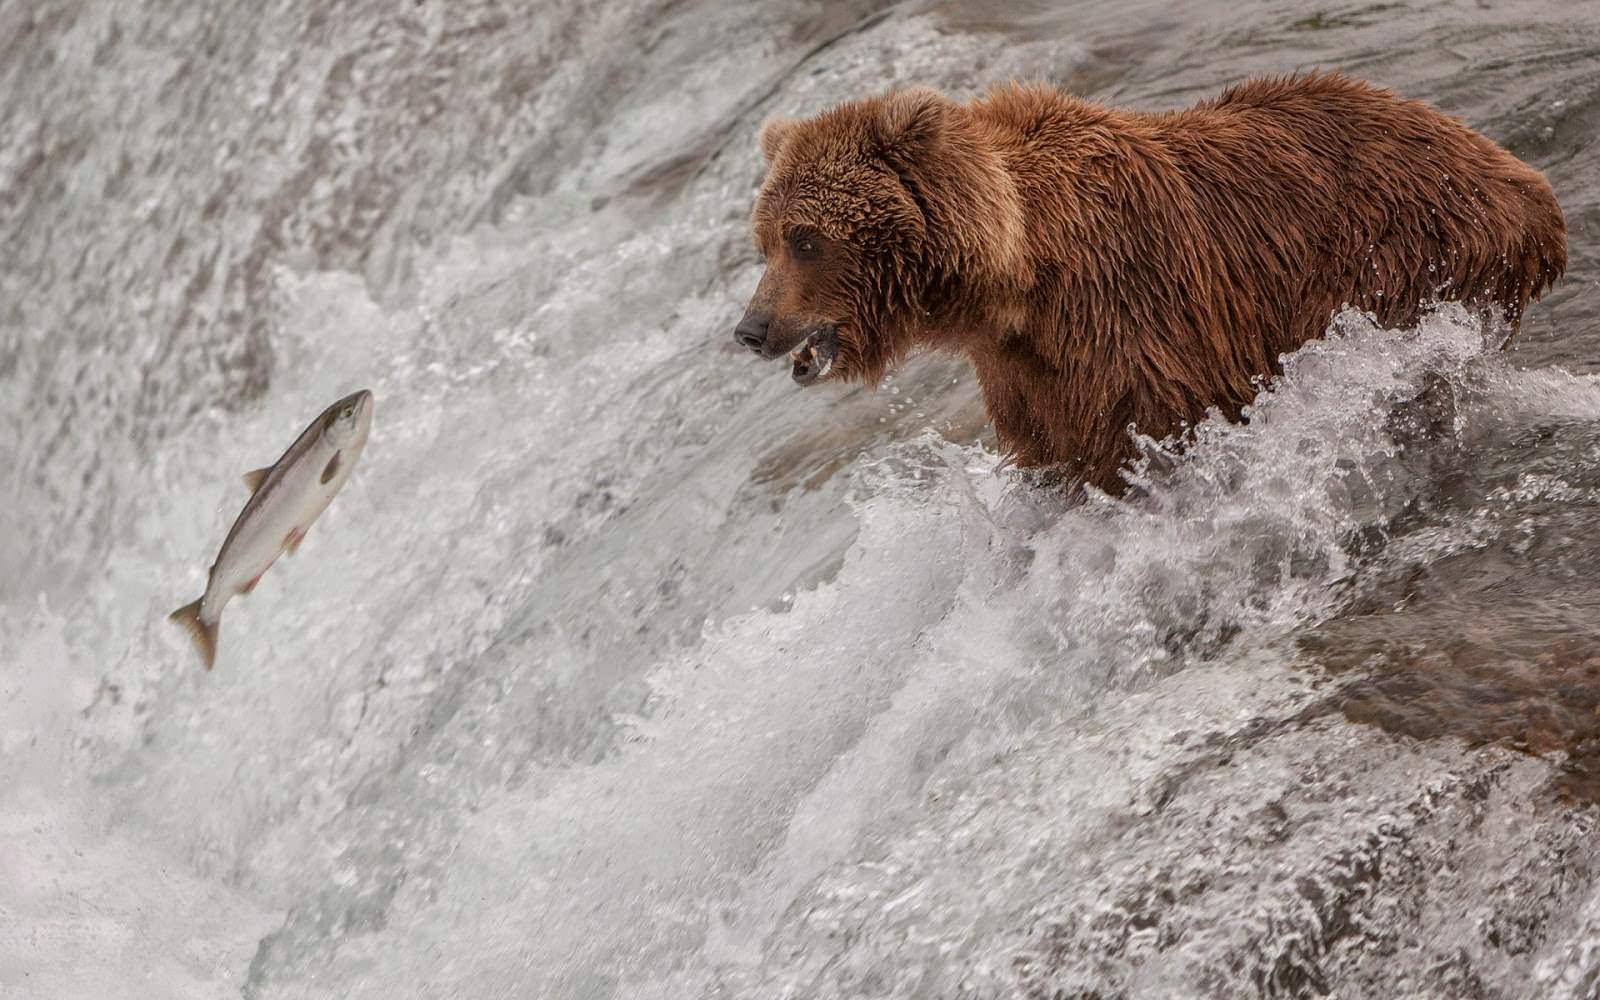 Bear Fishing in a River Wallpaper